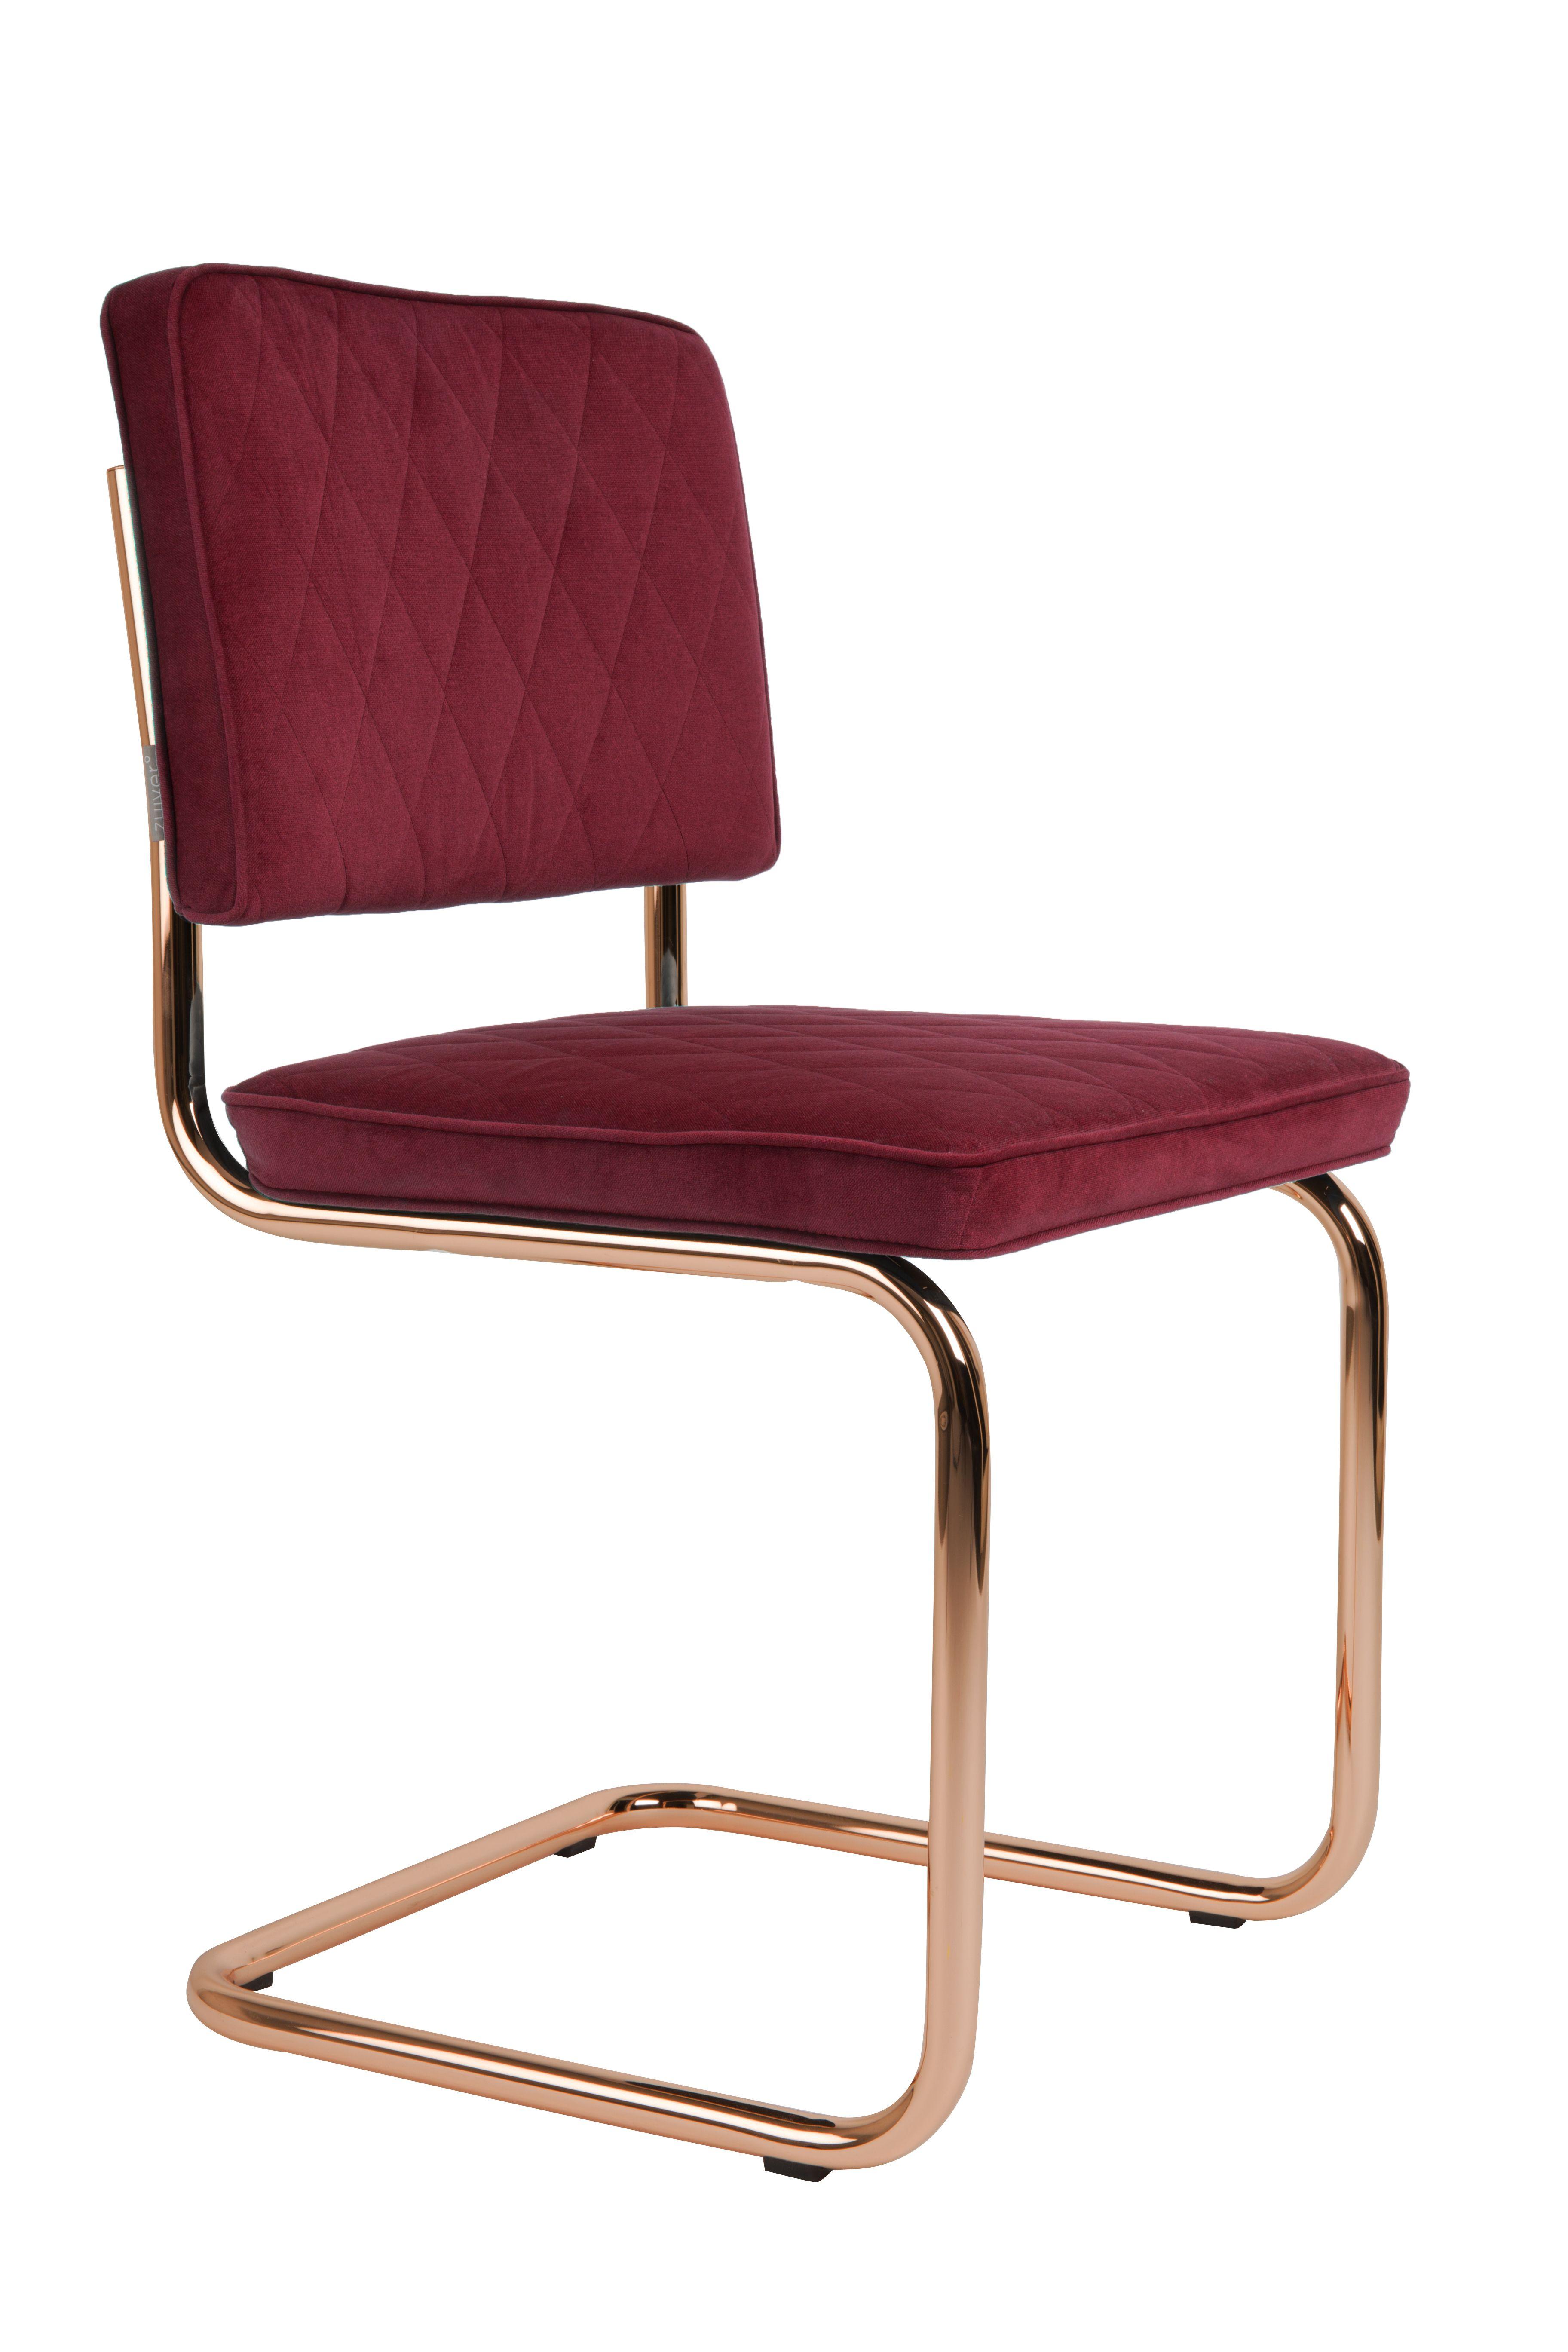 Diamond chair - Royal red#Chair #Chaise #Stuhl #Stoel   Zuiver ...